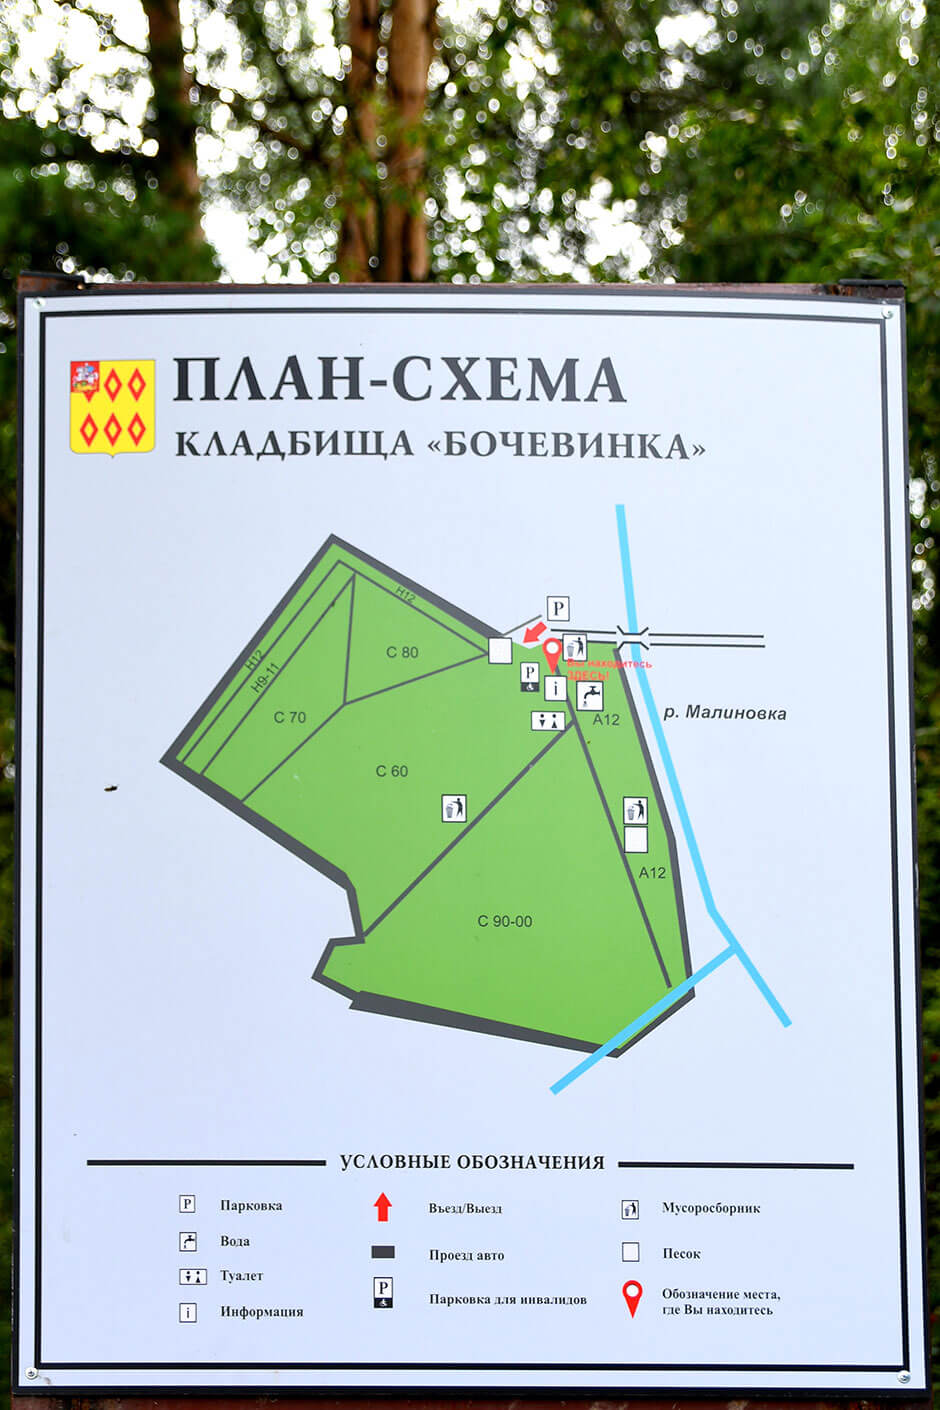 Кладбище Бочевинка. Фото 5